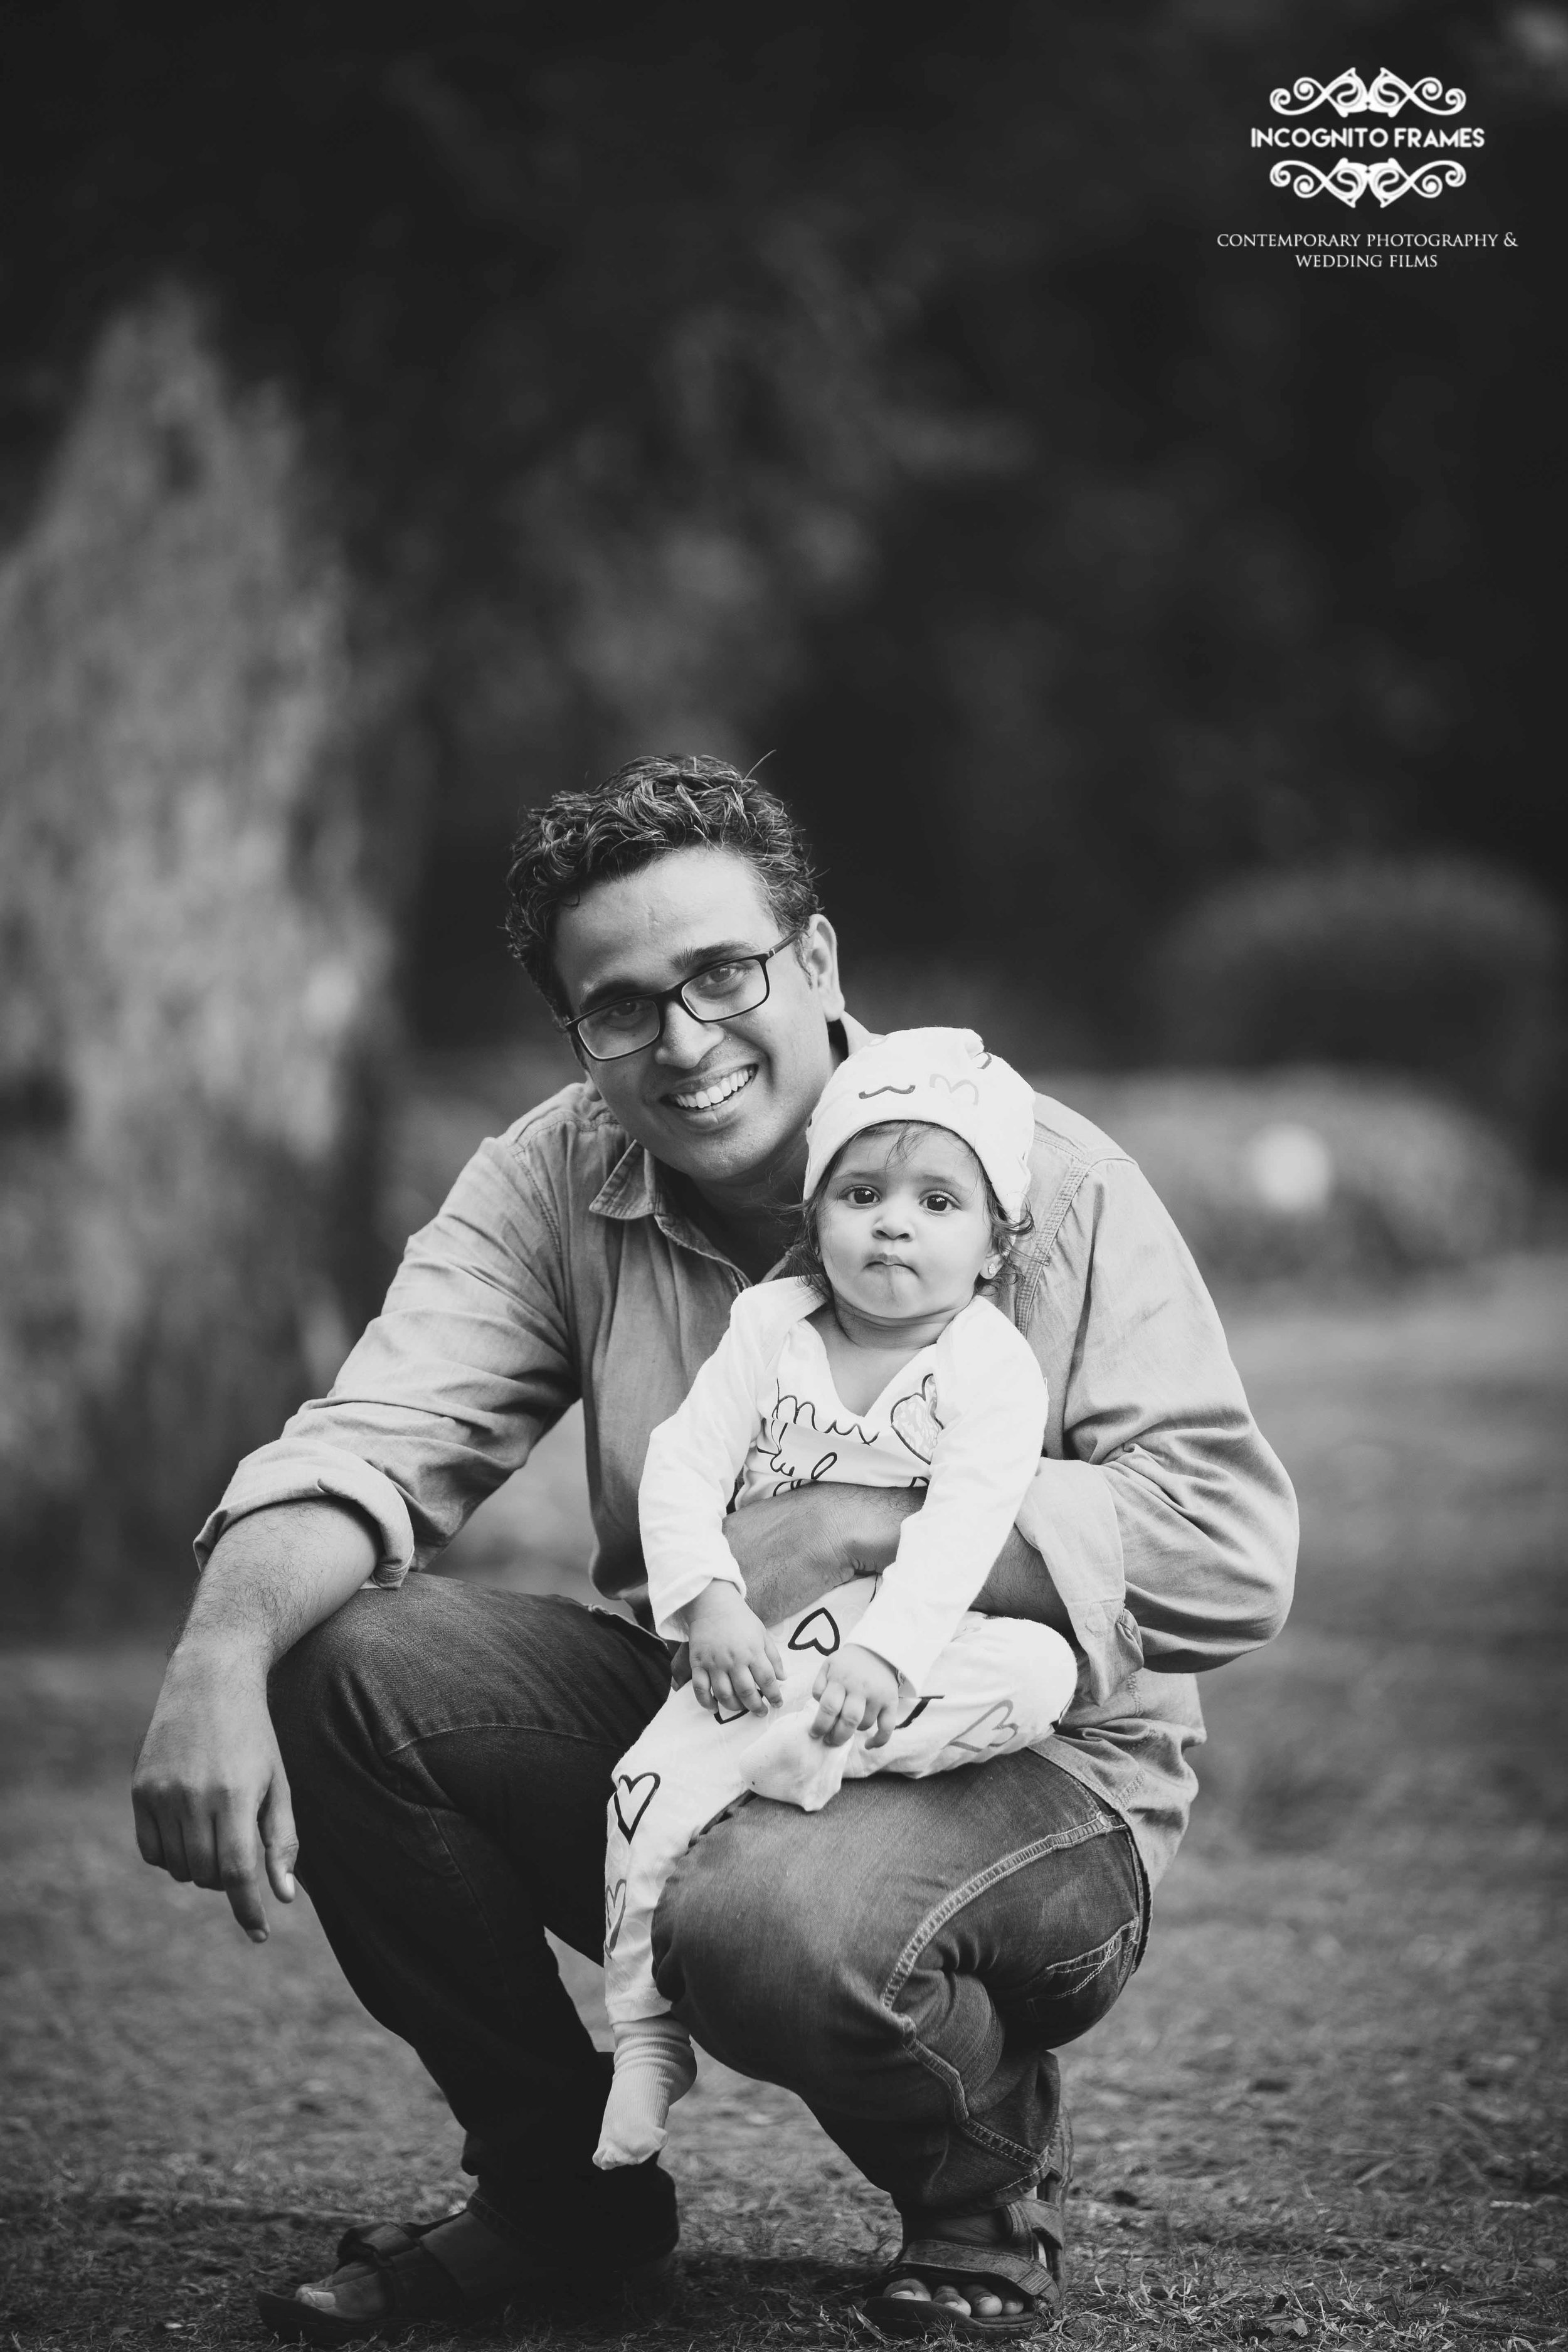 dad-daughter-kidsportraits.jpg